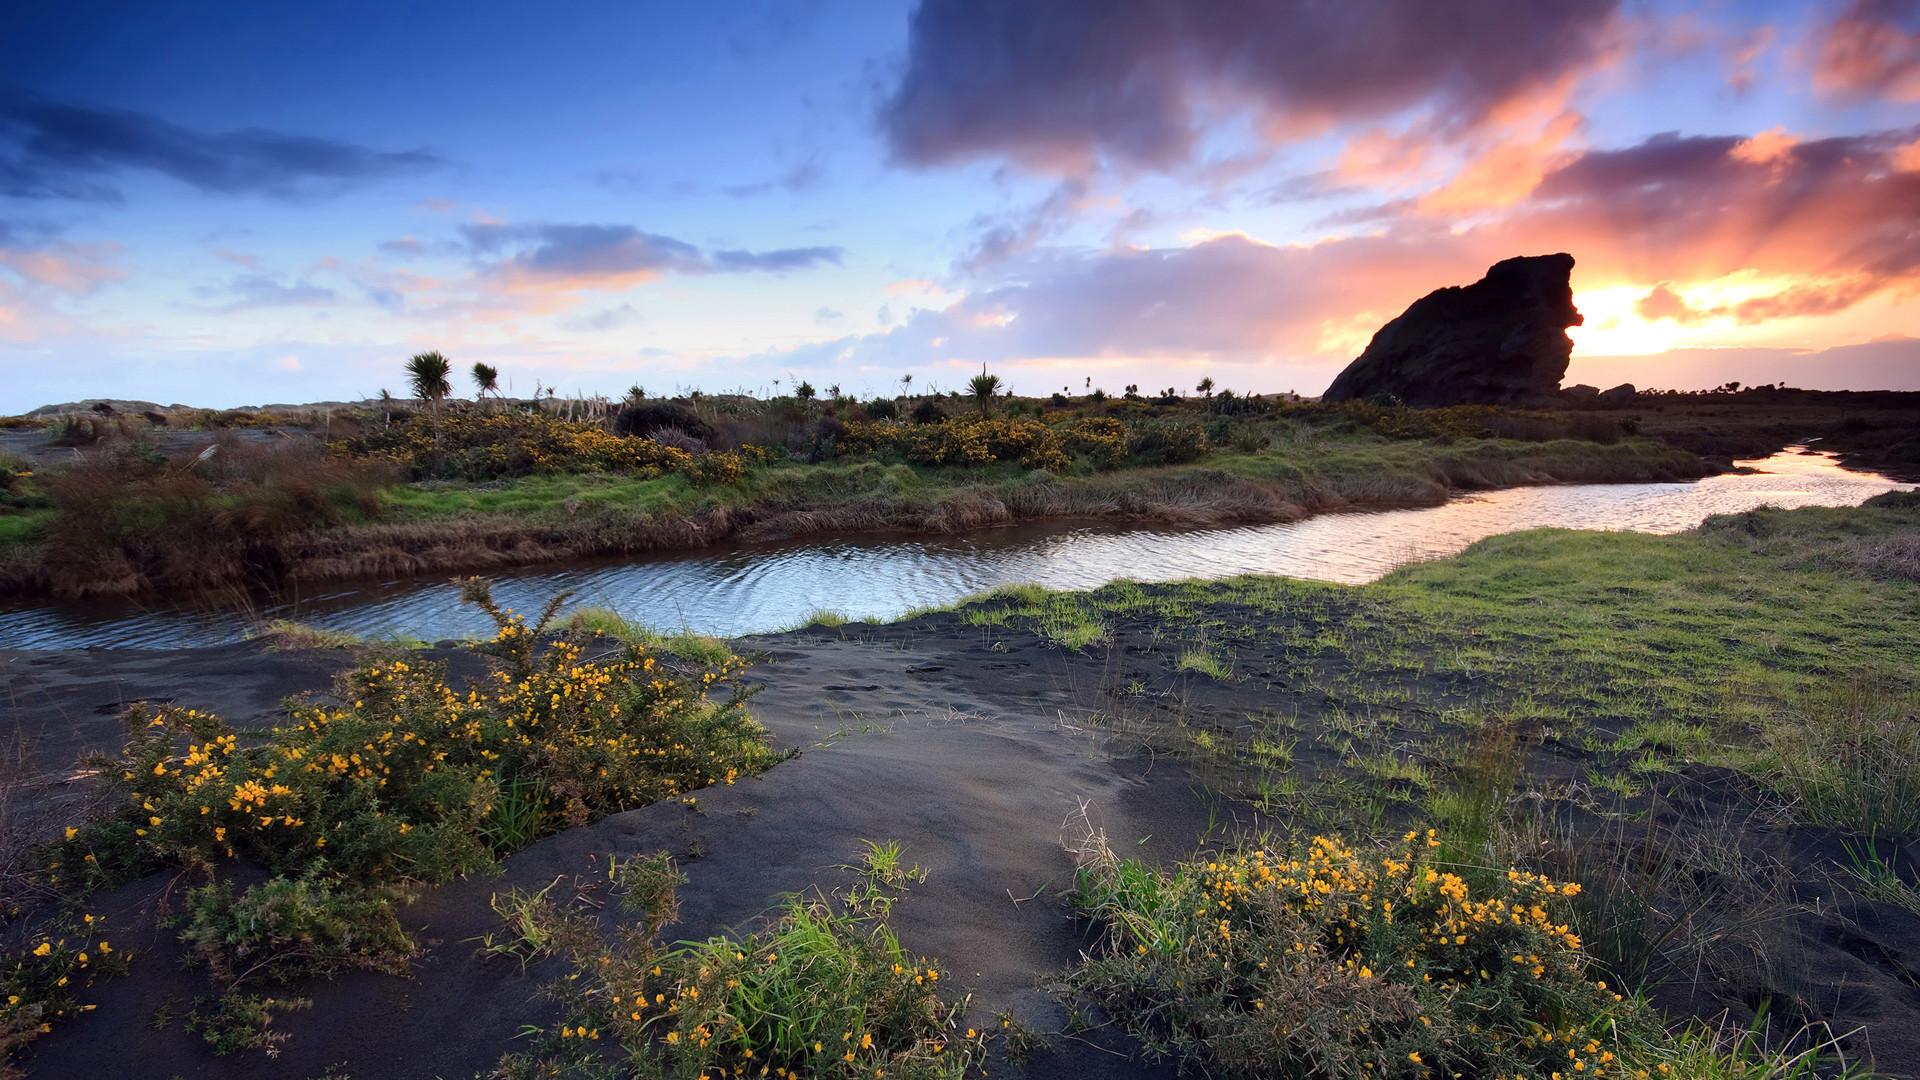 Landscape | Full HD Wallpapers, download 1080p desktop backgrounds